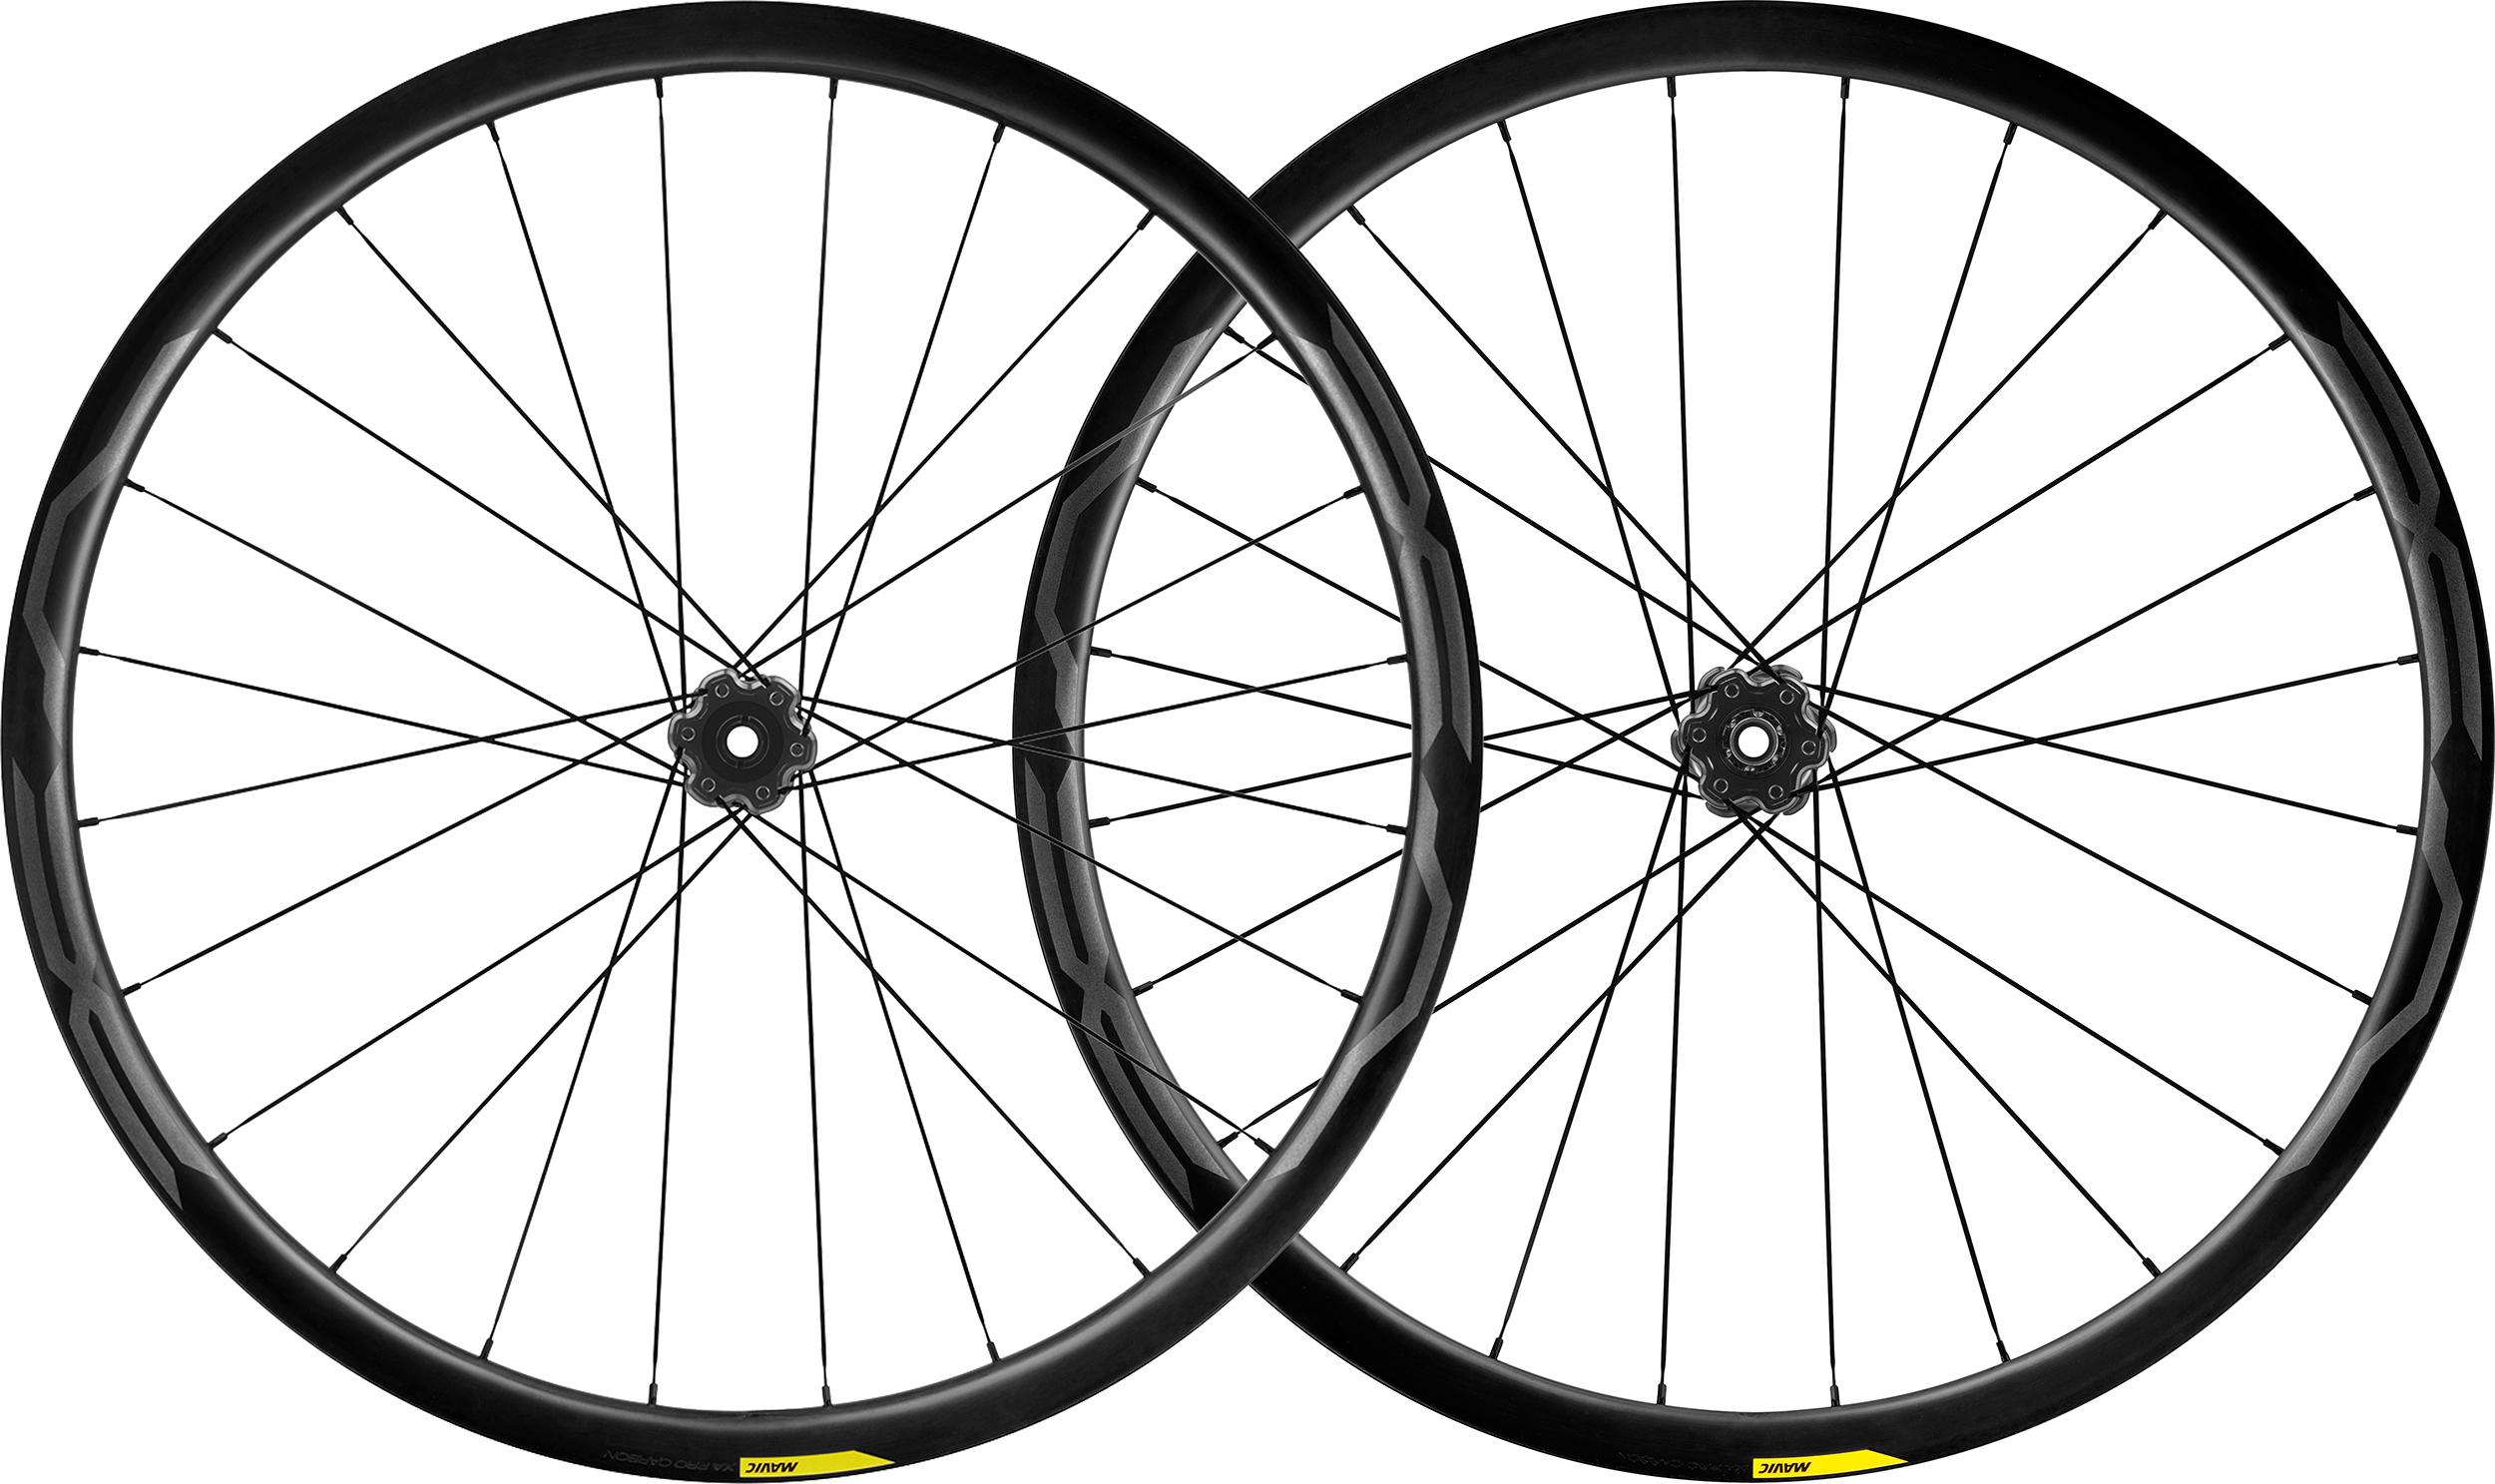 d47f7a55ce4 Bike wheels for Mountain biking